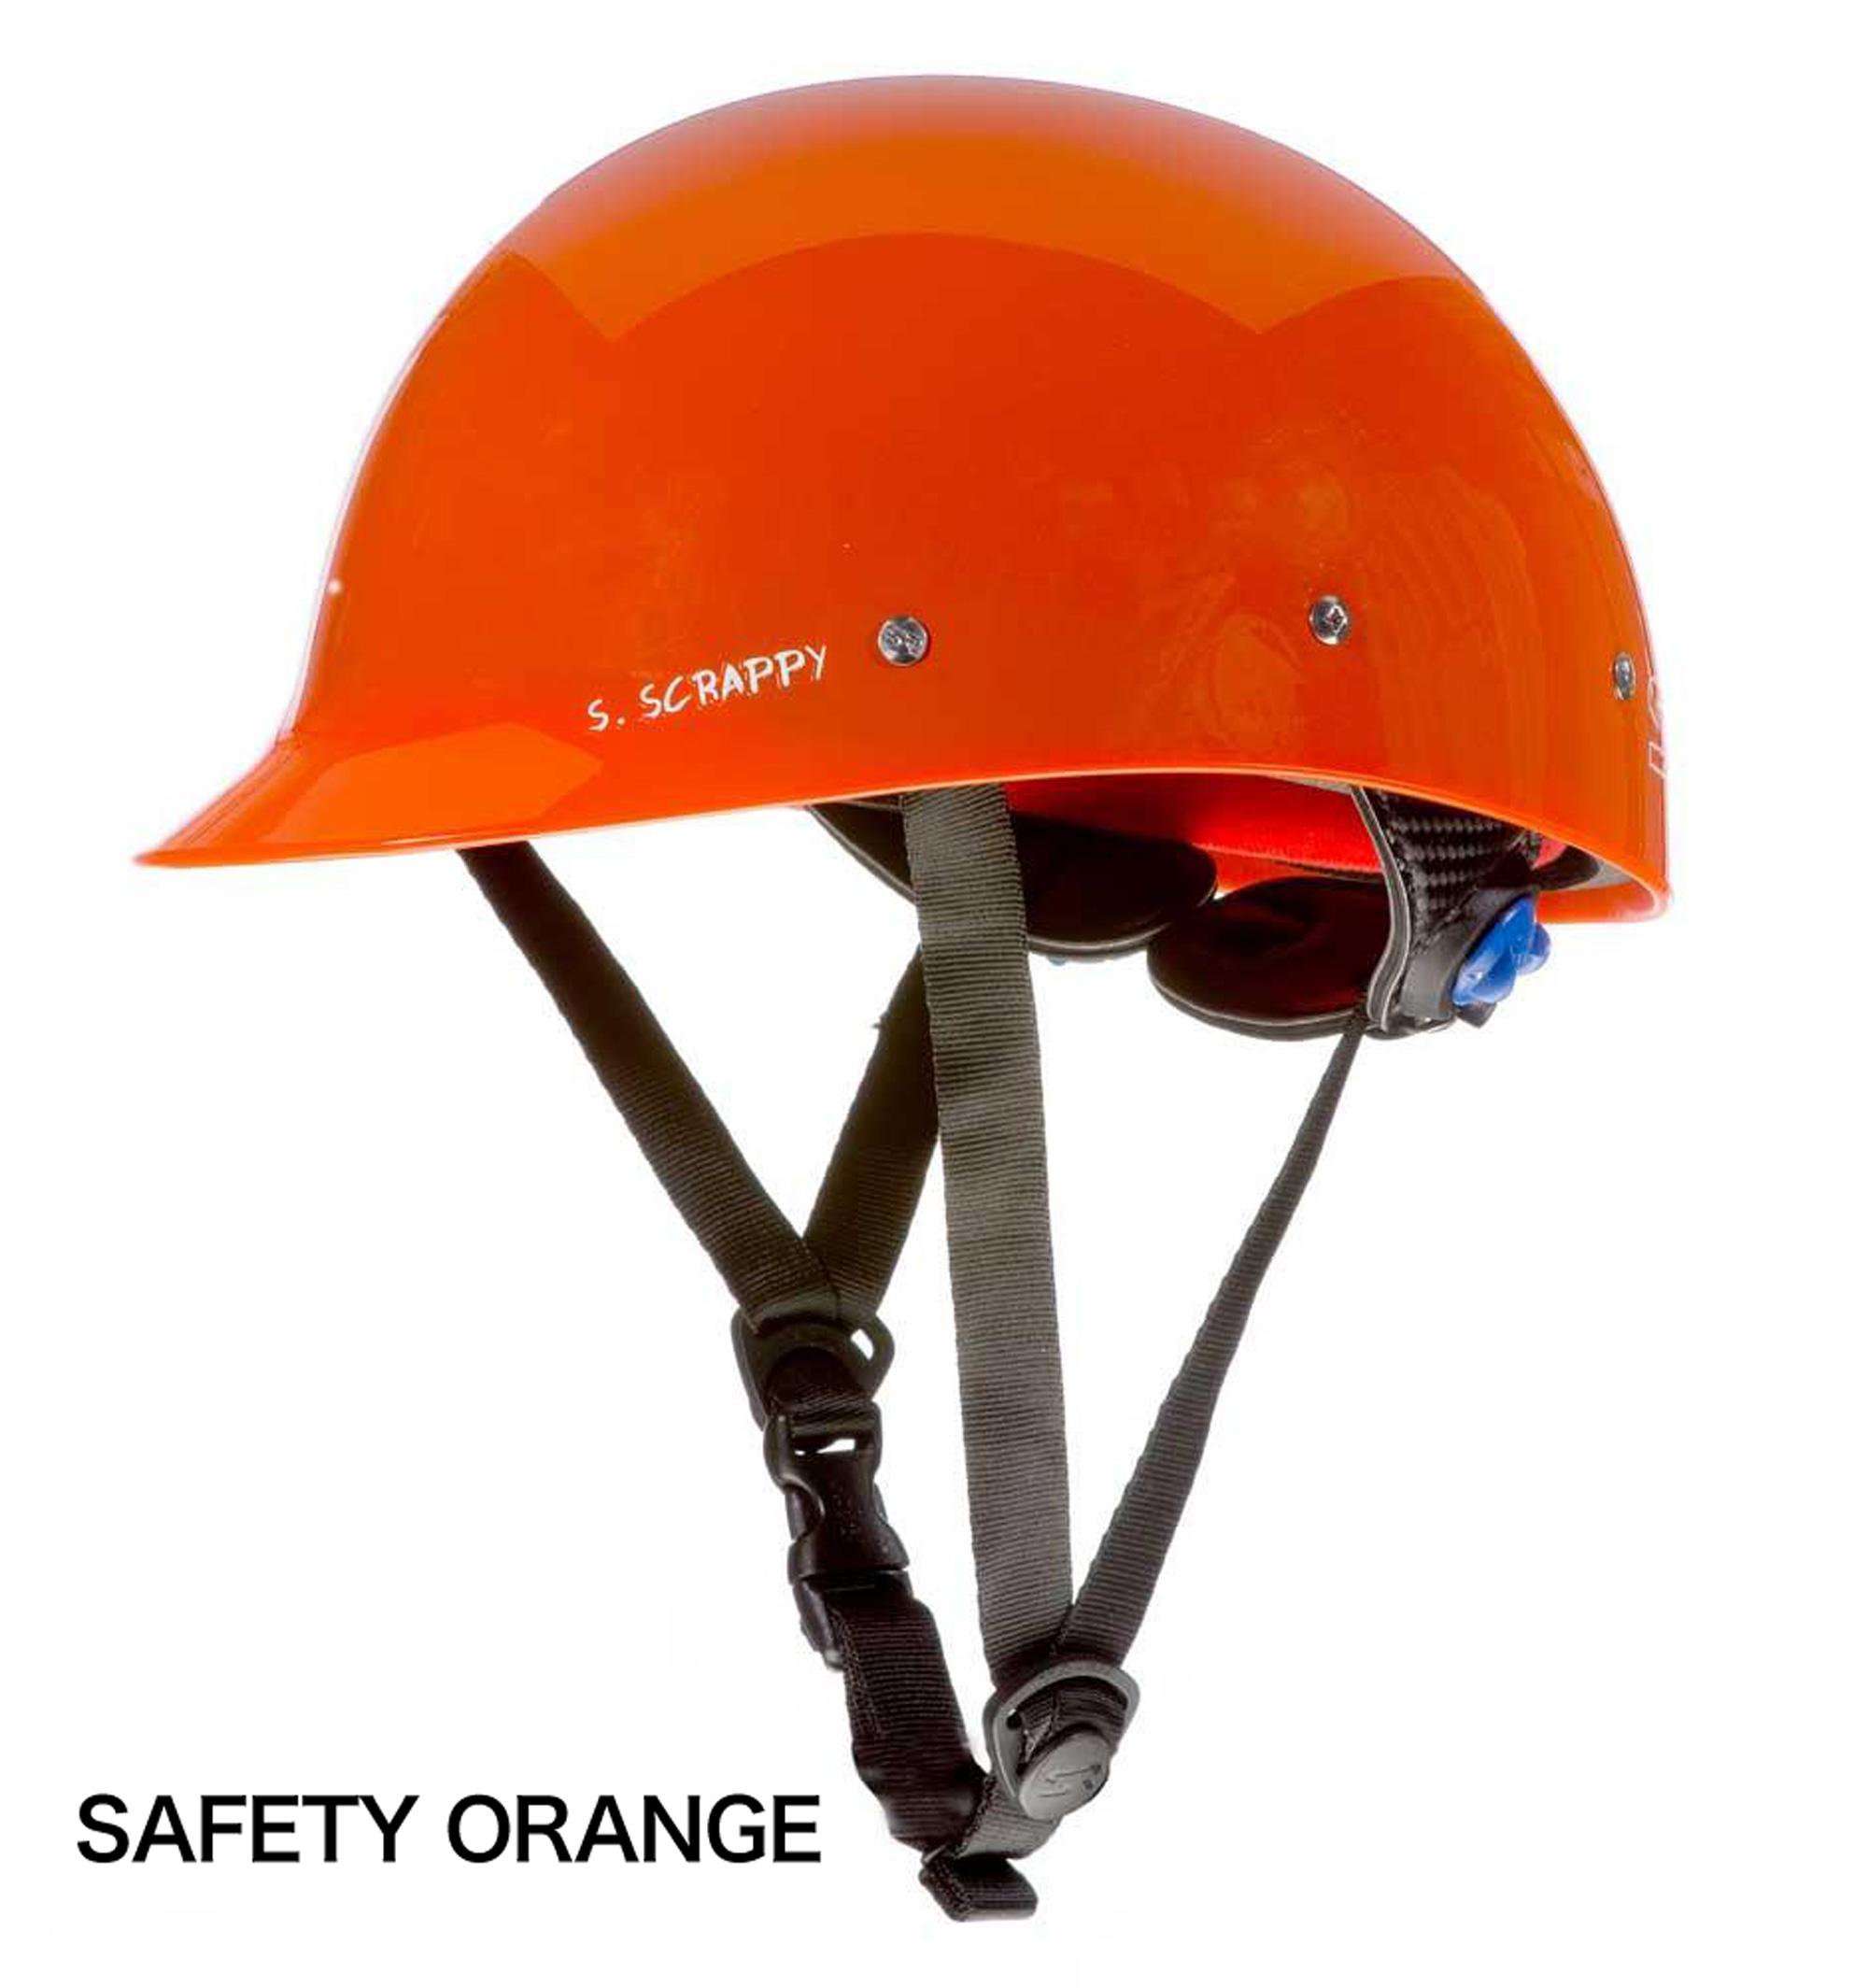 【Shred Ready(シュレッド・レディー)】ヘルメット Super Scrappy(スーパースクラッピー)